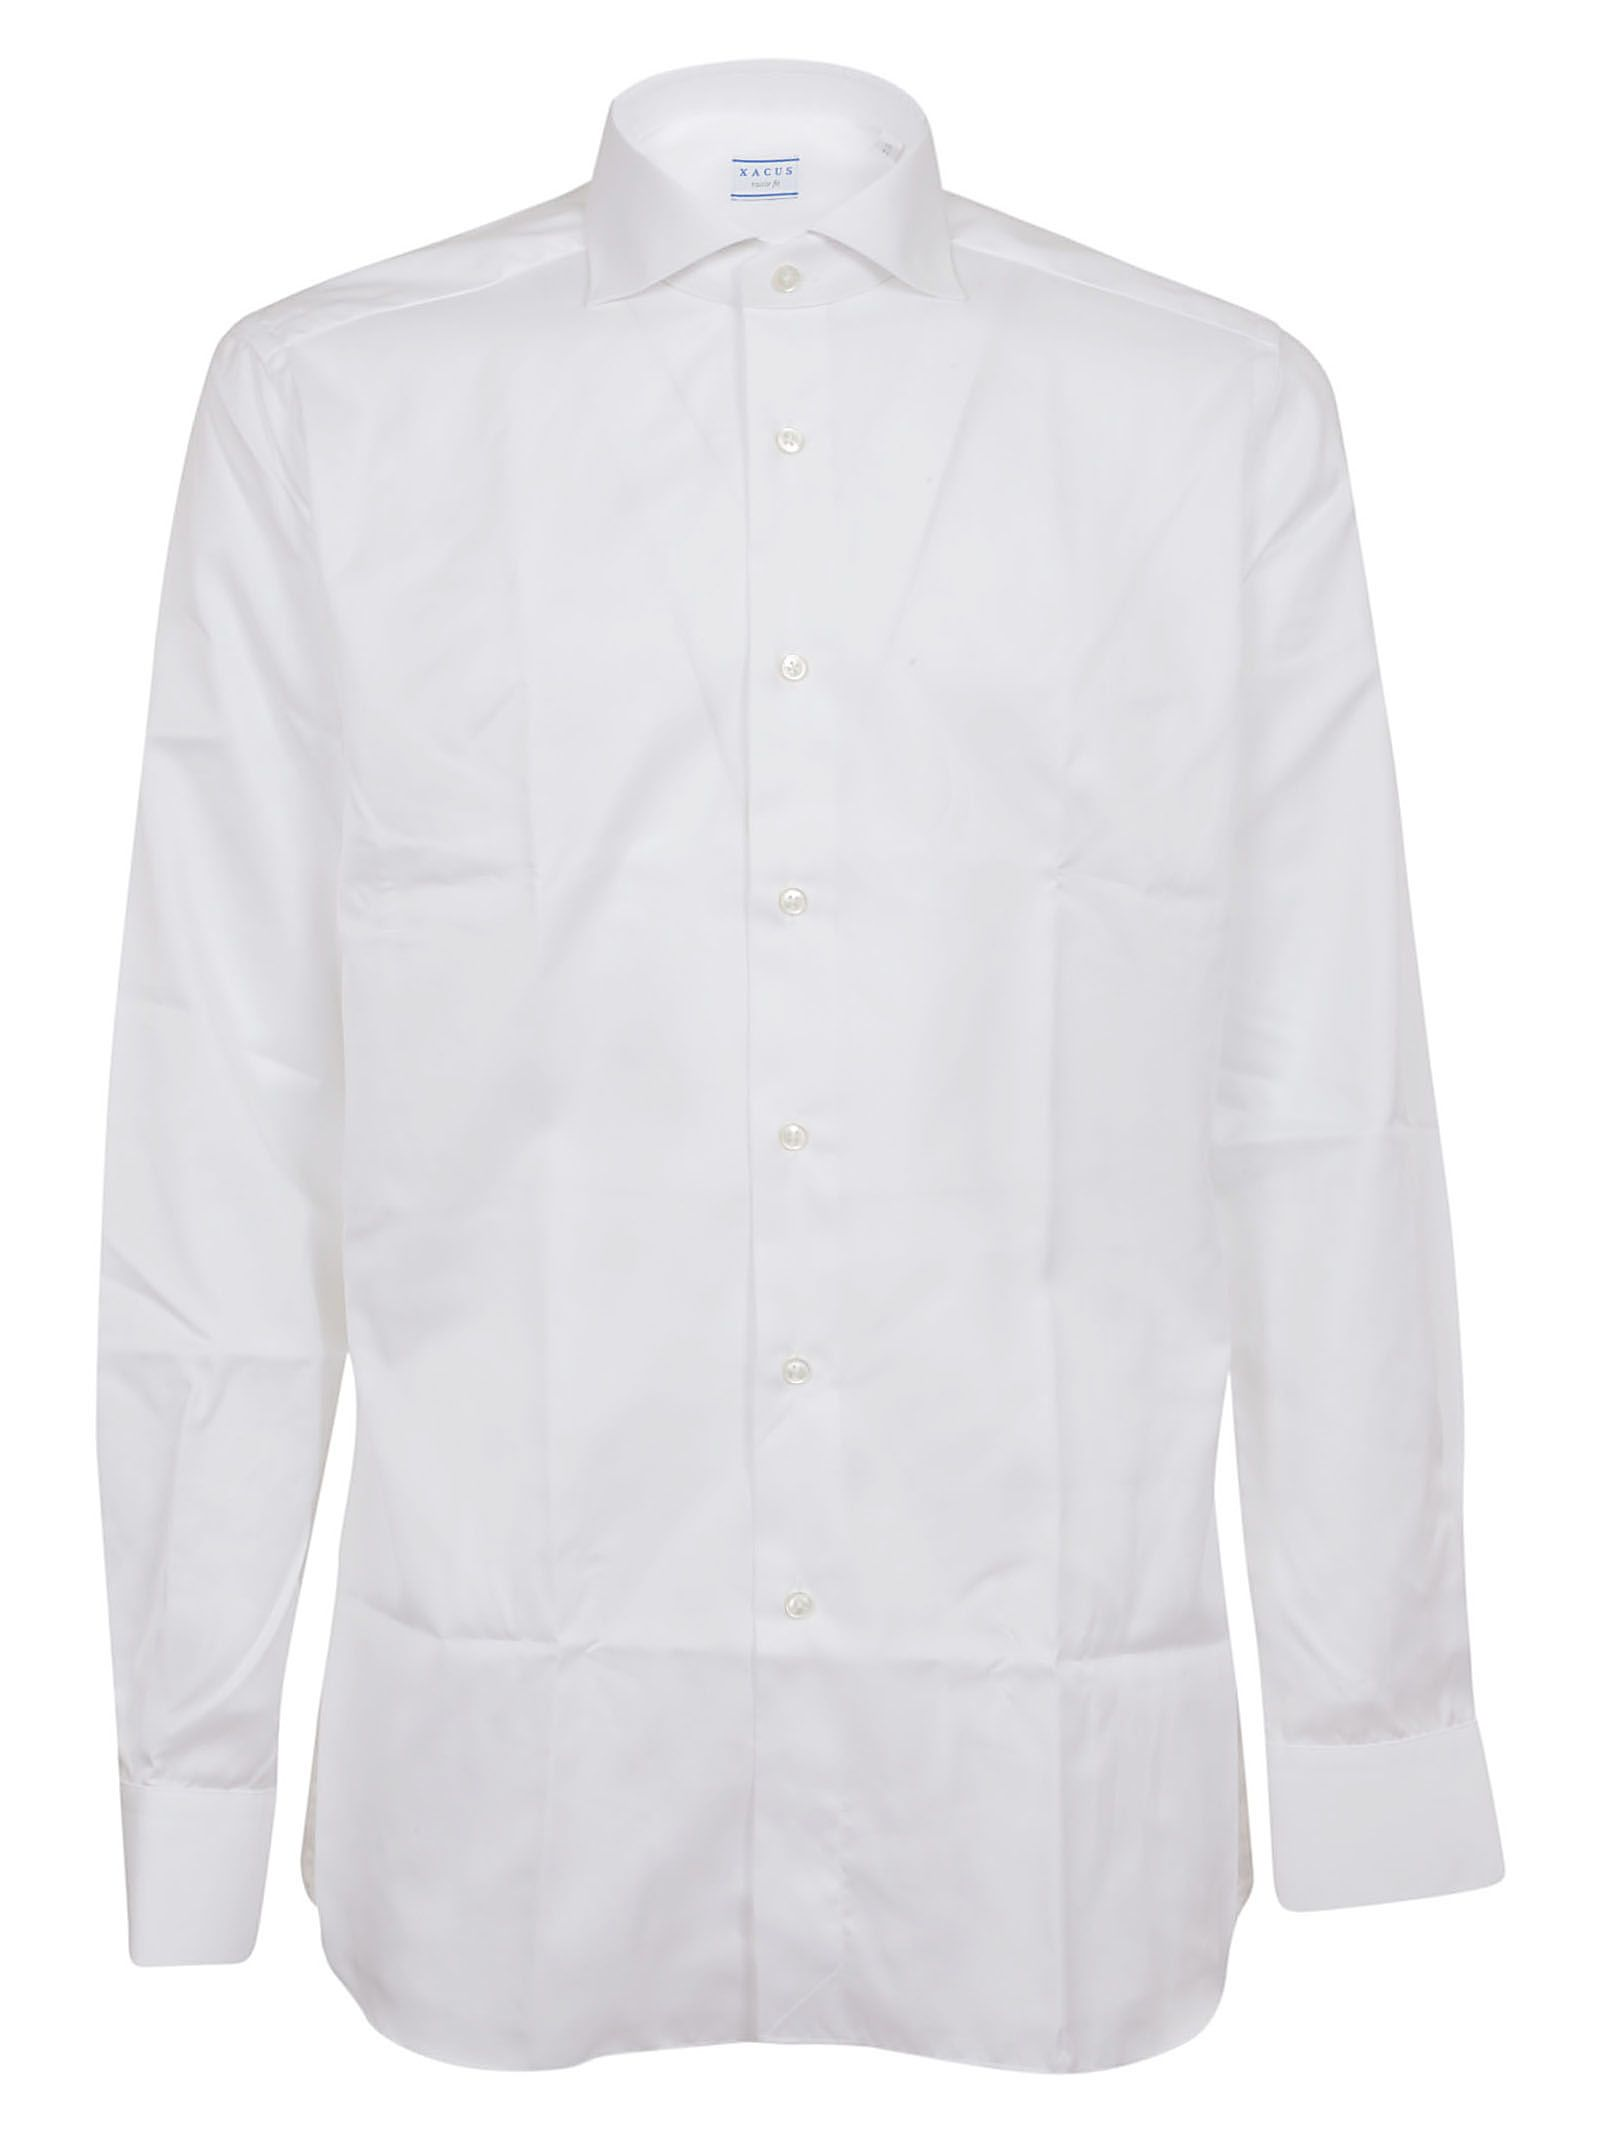 XACUS Textured Button Shirt in 001